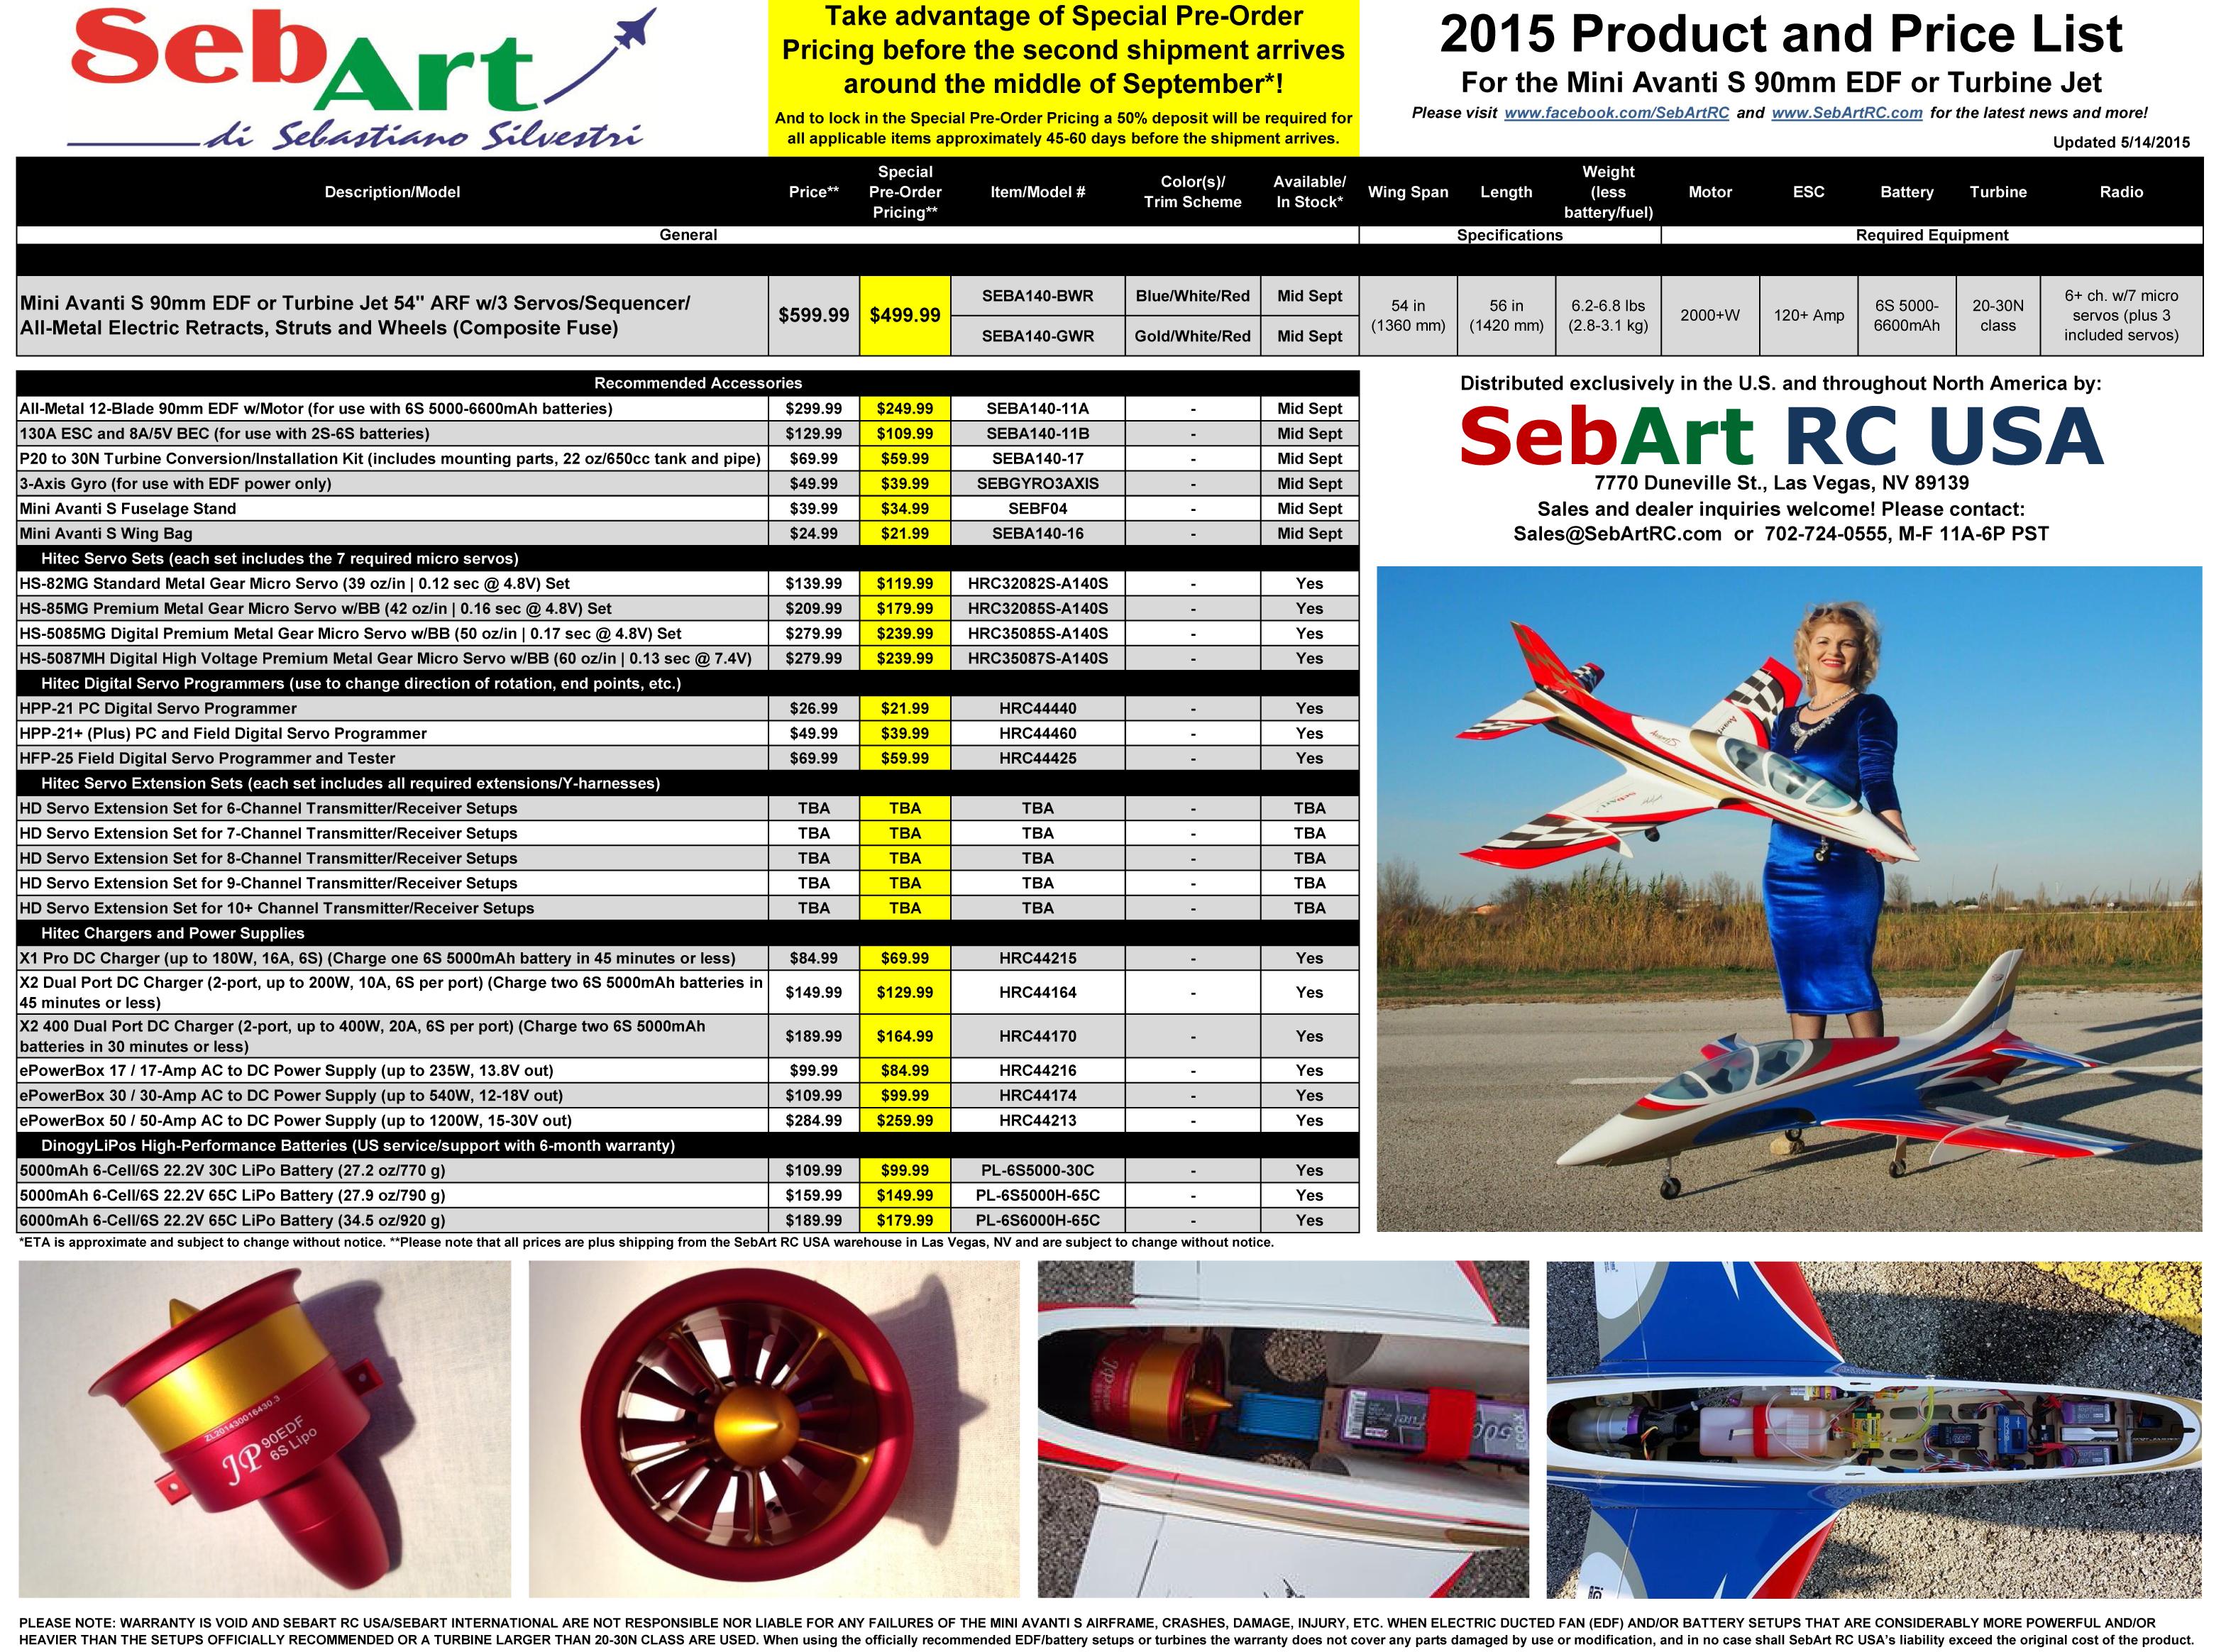 Click image for larger version  Name:SebArt RC USA Mini Avanti S 90mm EDF or Turbine Jet Product and Price List 051415.jpg Views:1241 Size:3.27 MB ID:2095969